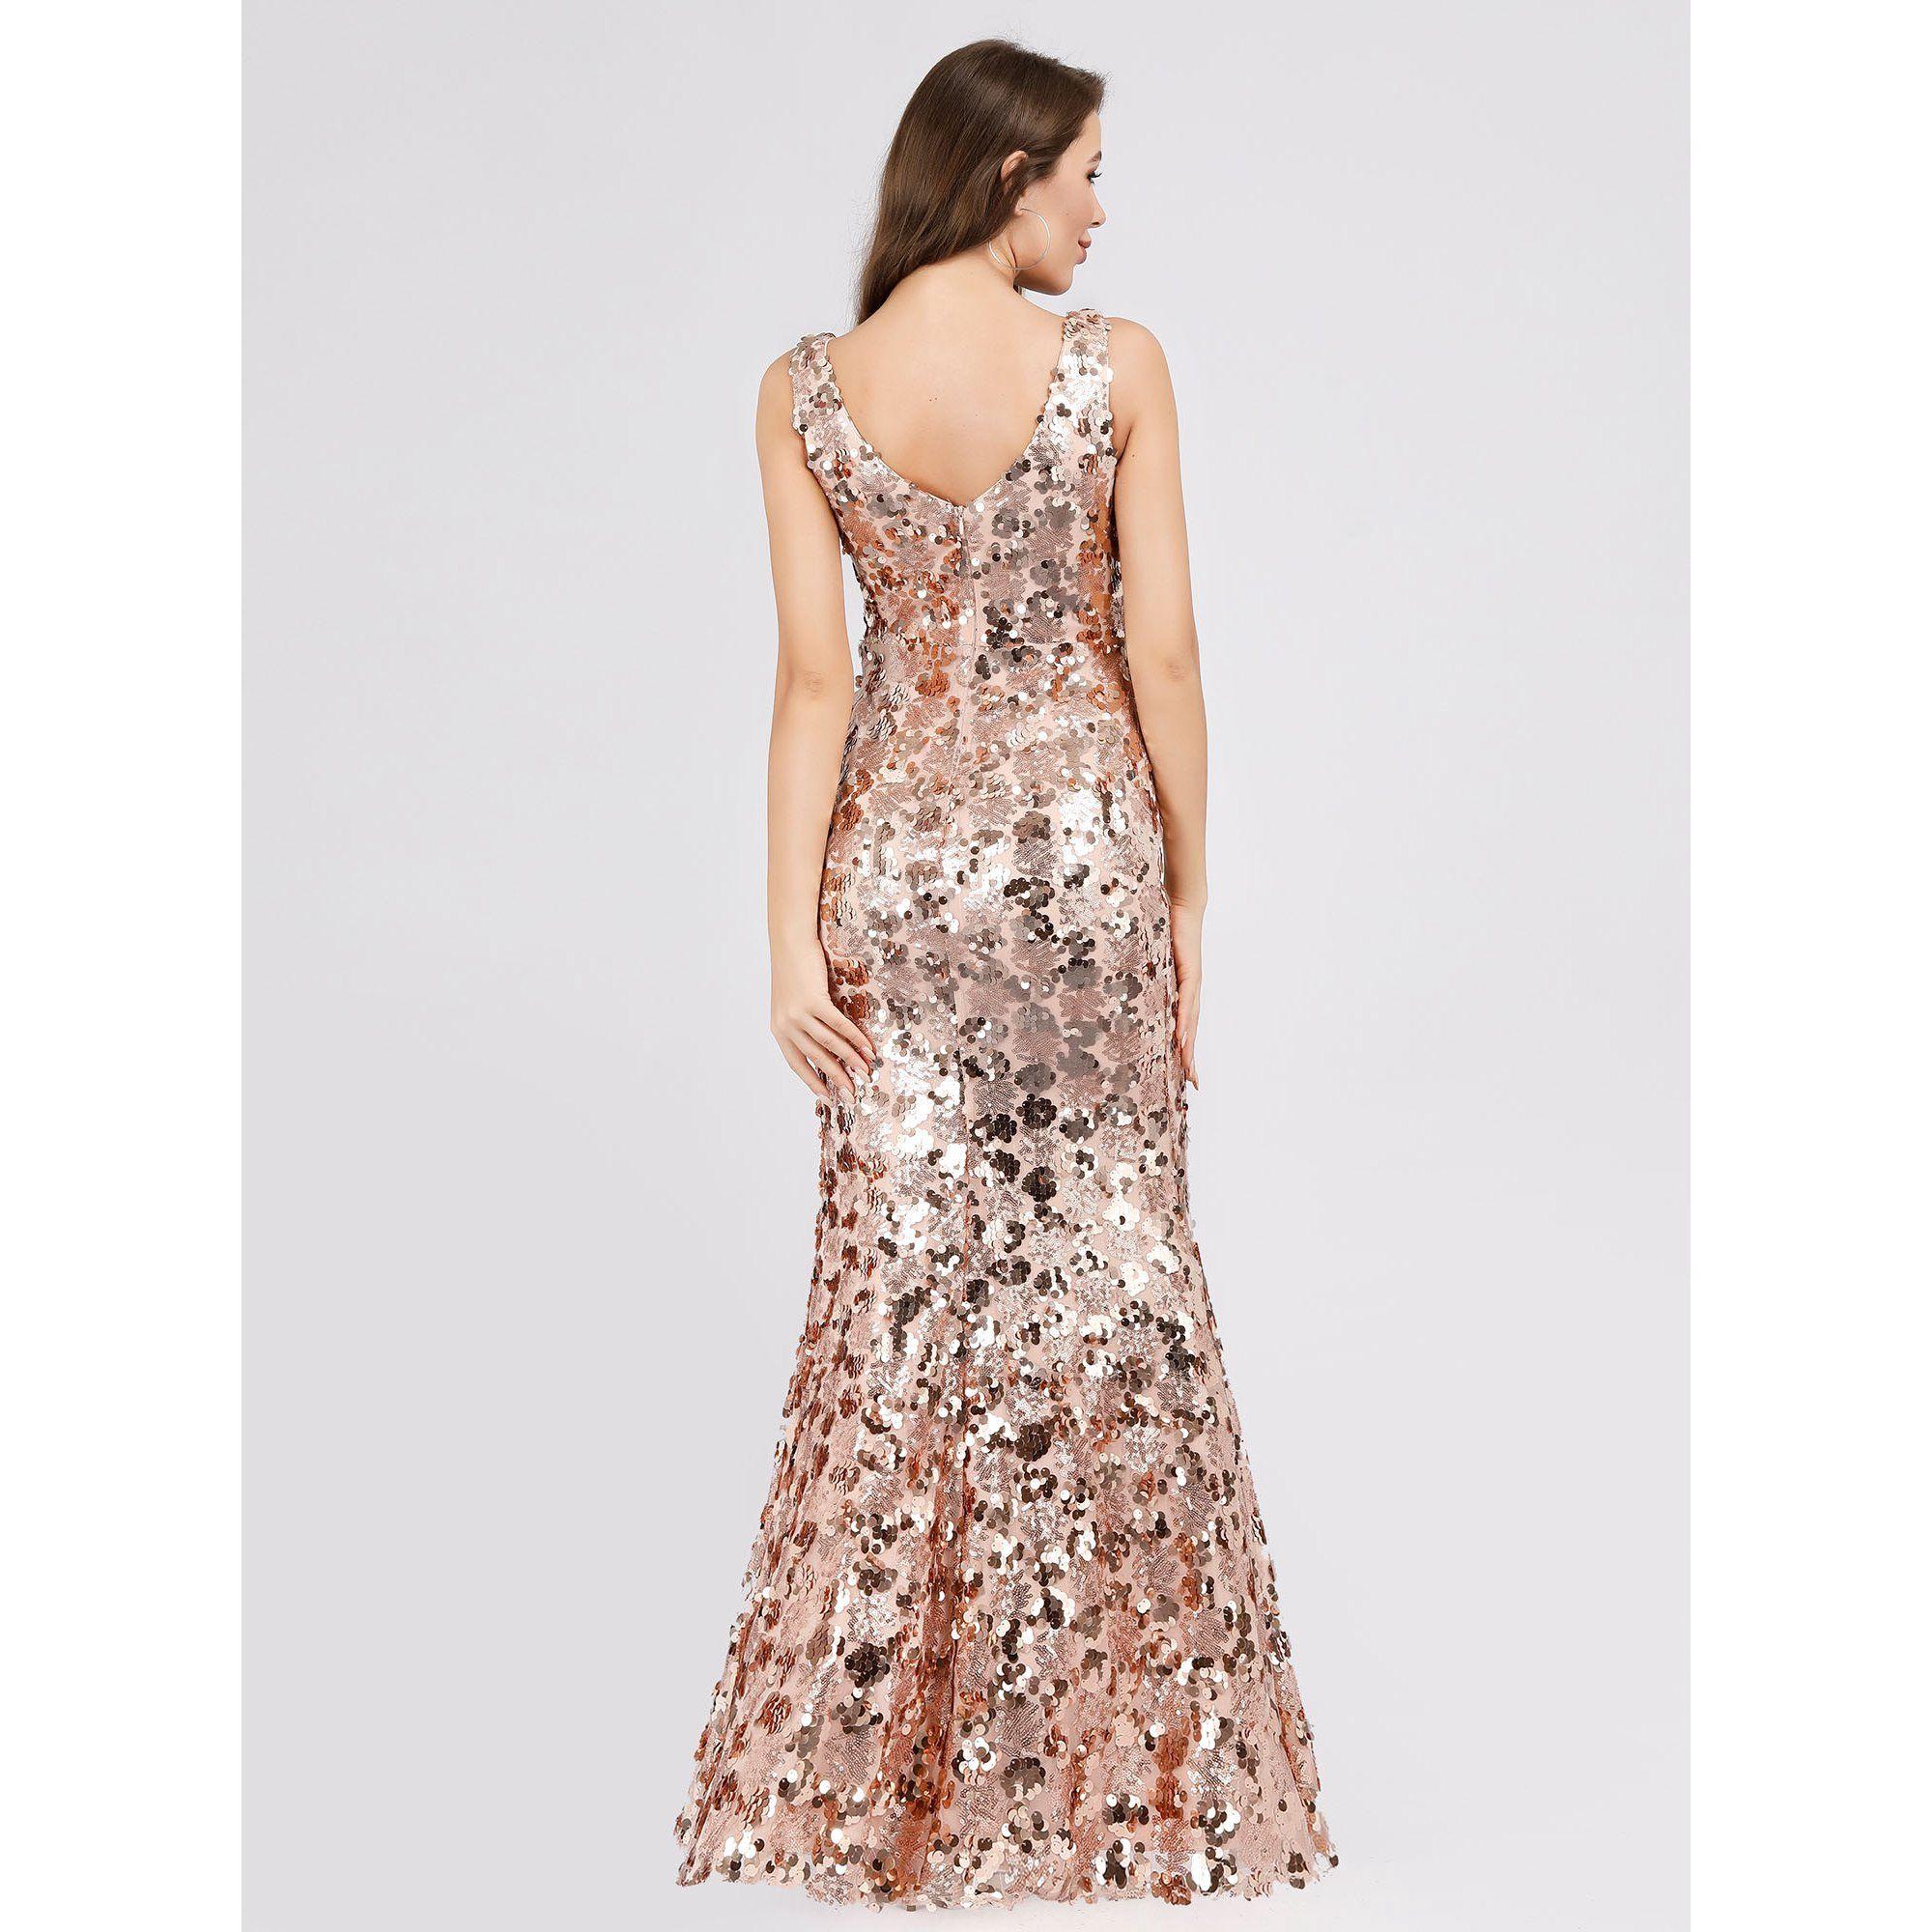 Ever Pretty Ever Pretty Womens Mermaid Prom Dresses For Women 07872 Gold Us4 Walmart Com In 2021 Long Mermaid Dress Evening Dresses Pattern Dress Women [ 2000 x 2000 Pixel ]